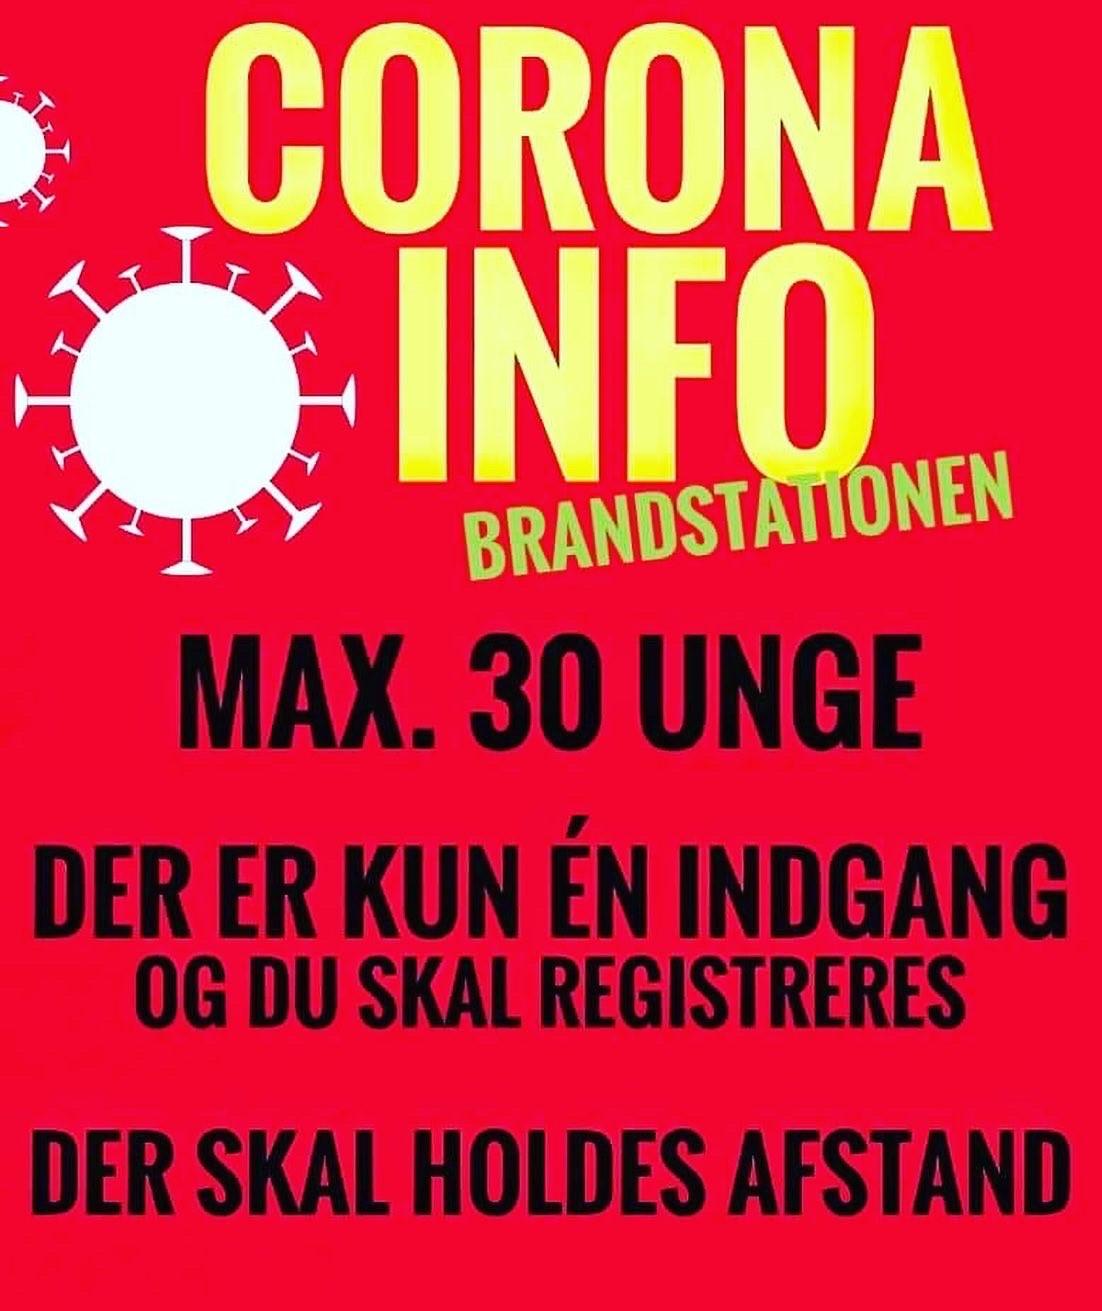 Coronainfo Brandstationen